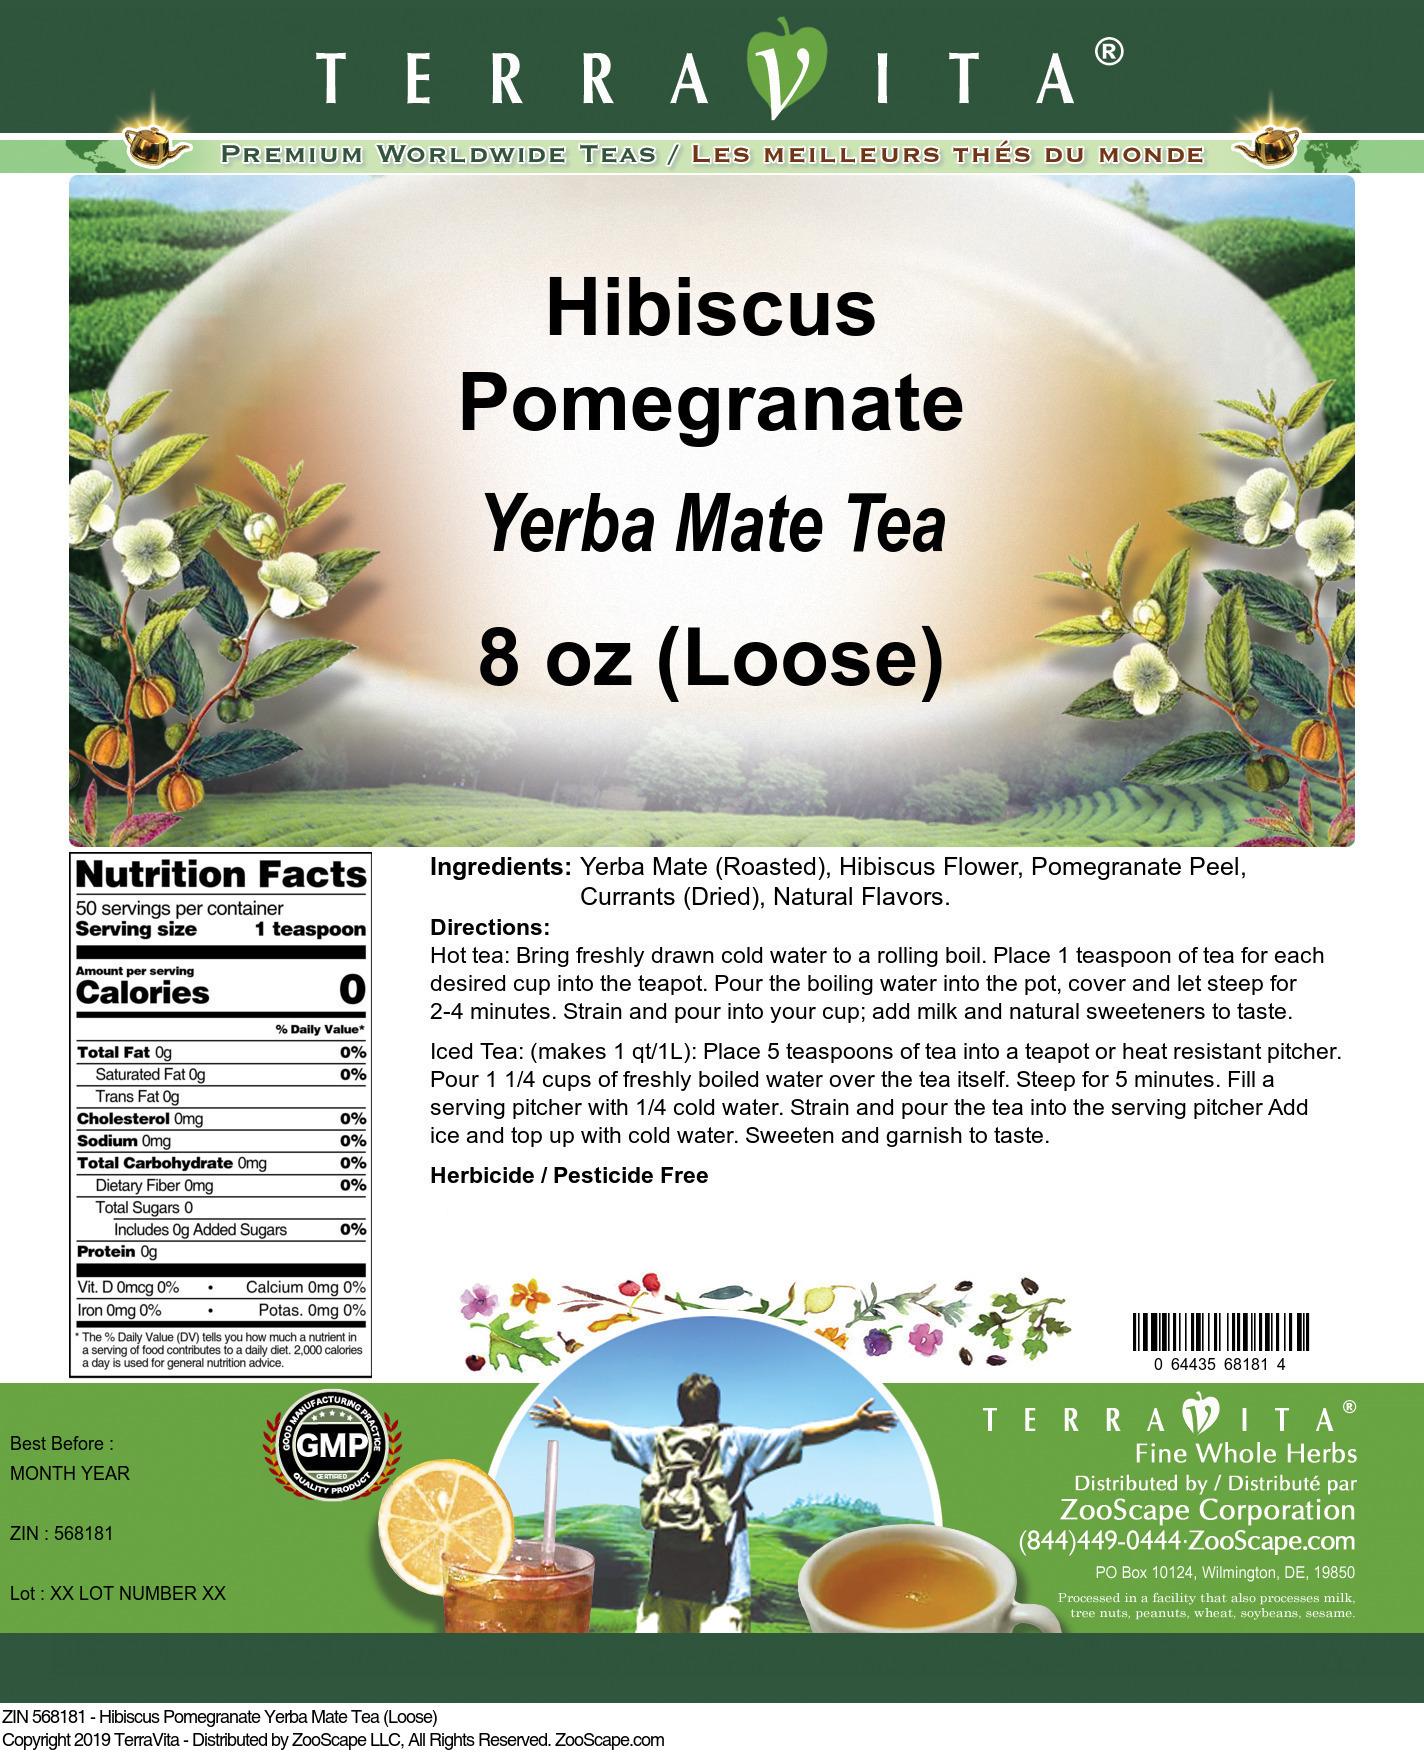 Hibiscus Pomegranate Yerba Mate Tea (Loose)